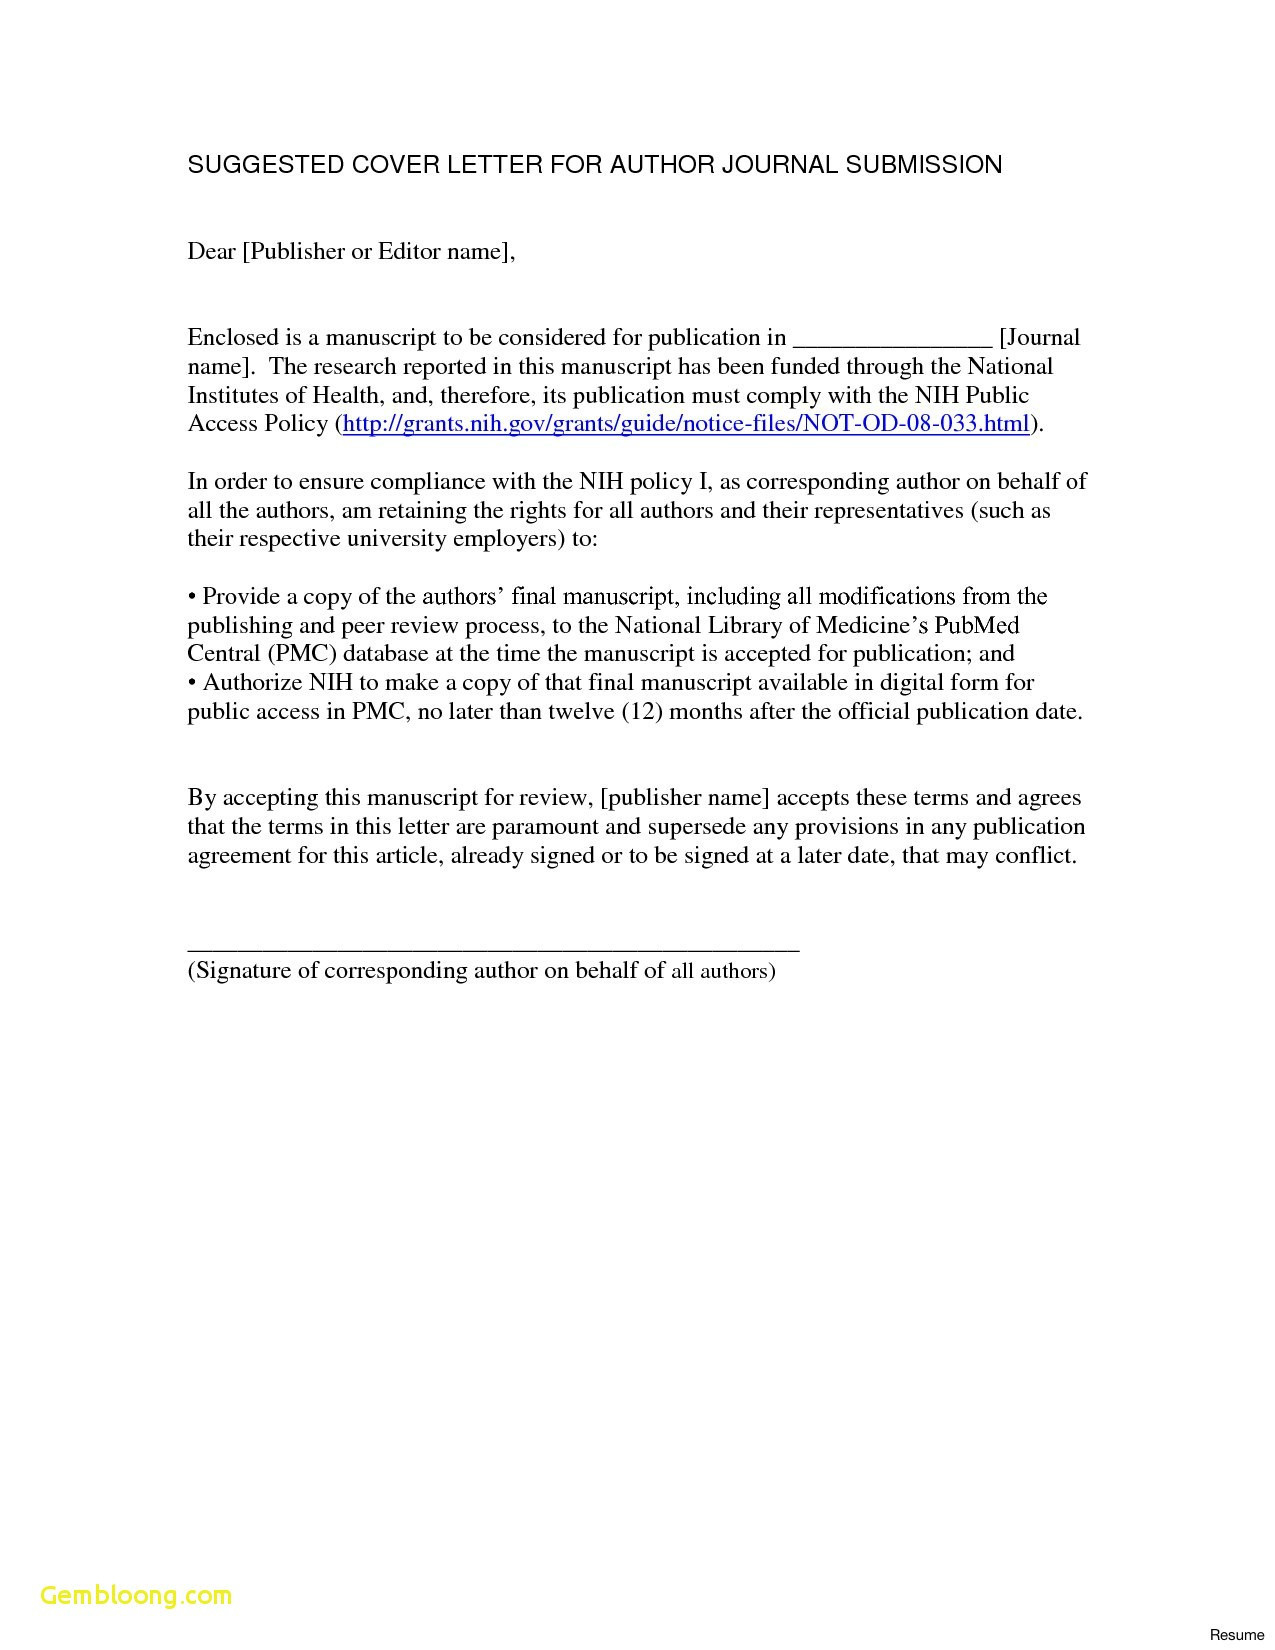 Legal Letter format Template - format for Resume Cover Letter Reference Job Application Letter